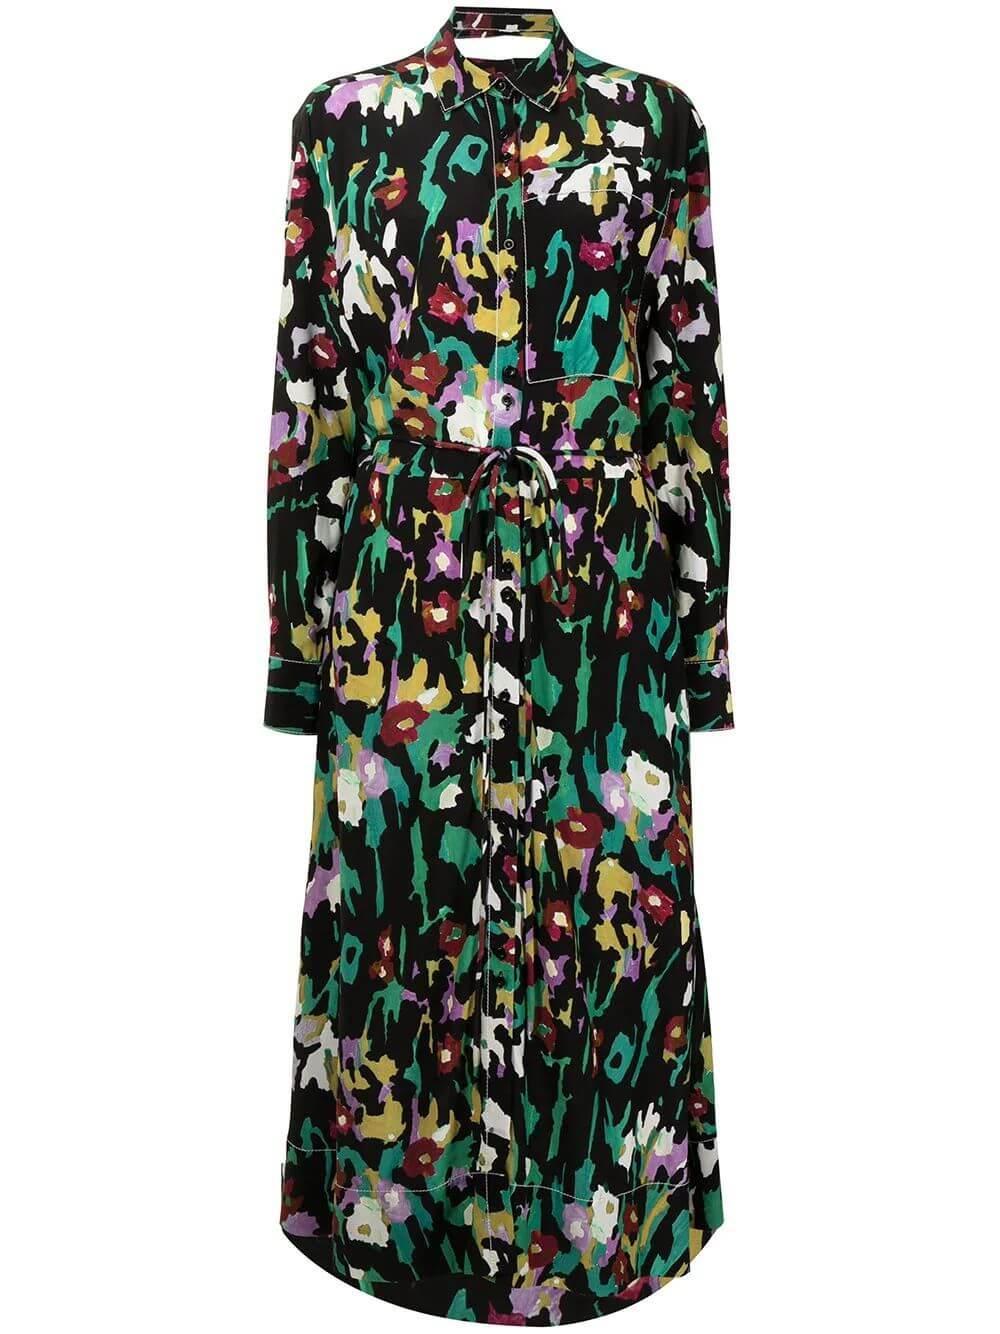 Painted Floral Shirt Dress Item # WL2133177